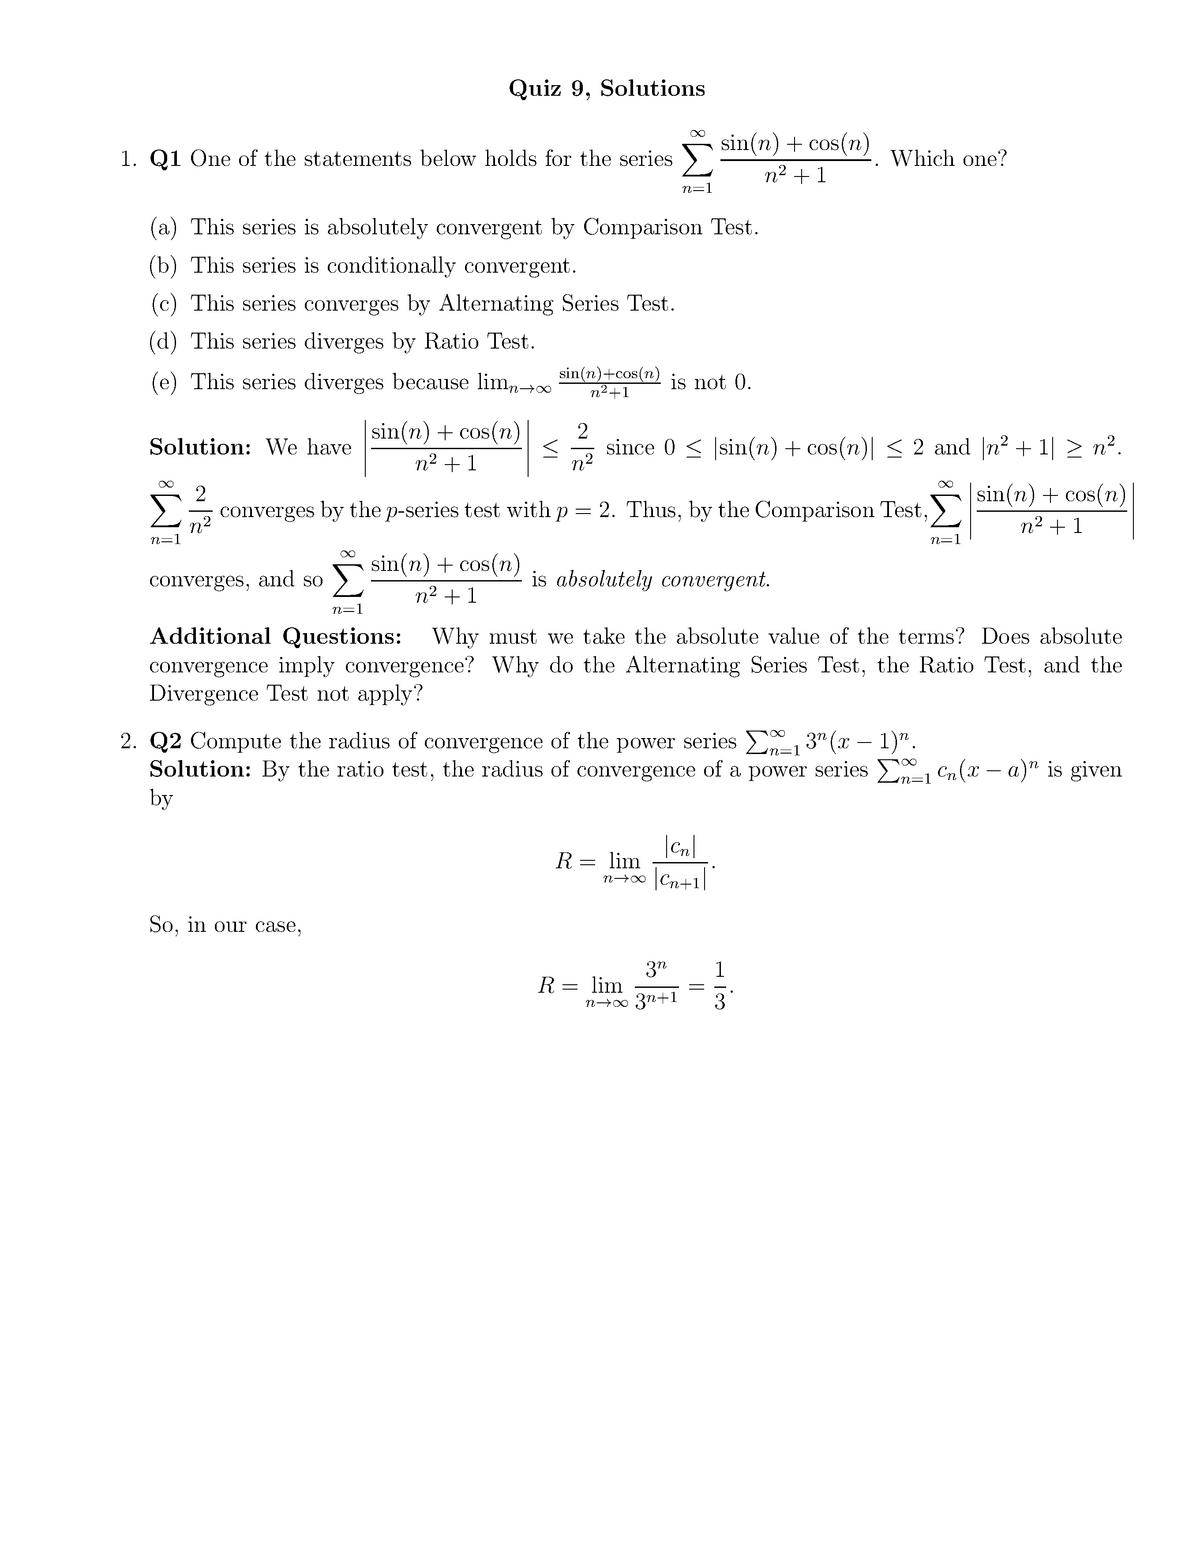 Quiz 9 solutions - - MATH 10560 Calculus II - StuDocu